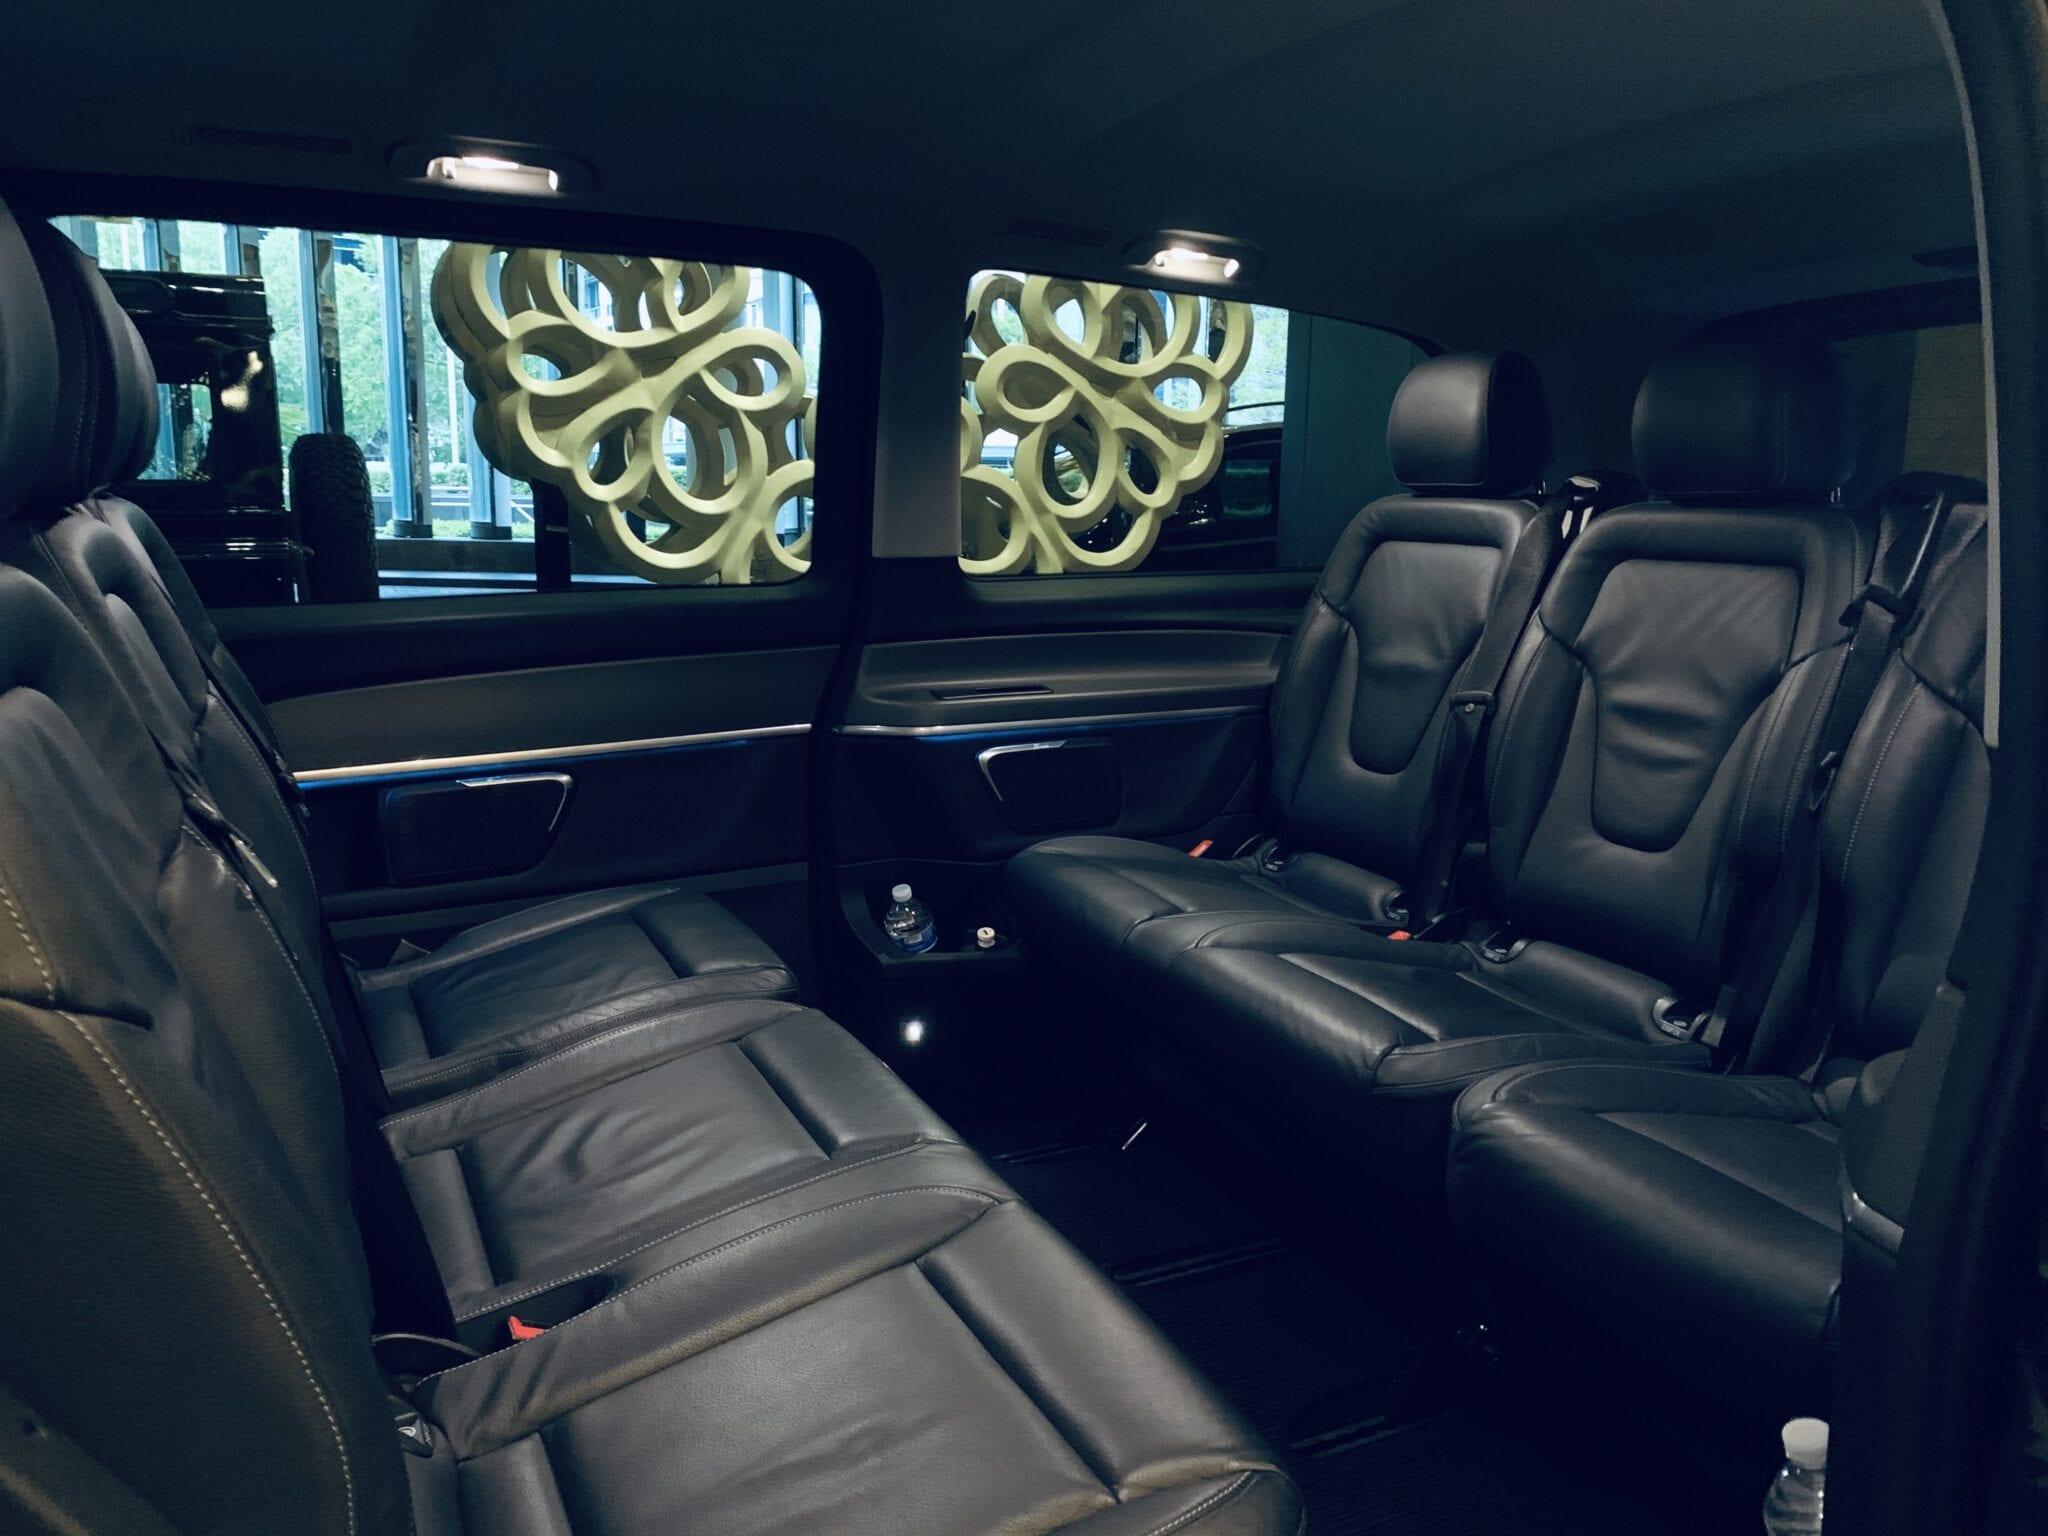 flybus minivan hire fleet mercedes-benz v-class avant-garde black color 7 seater